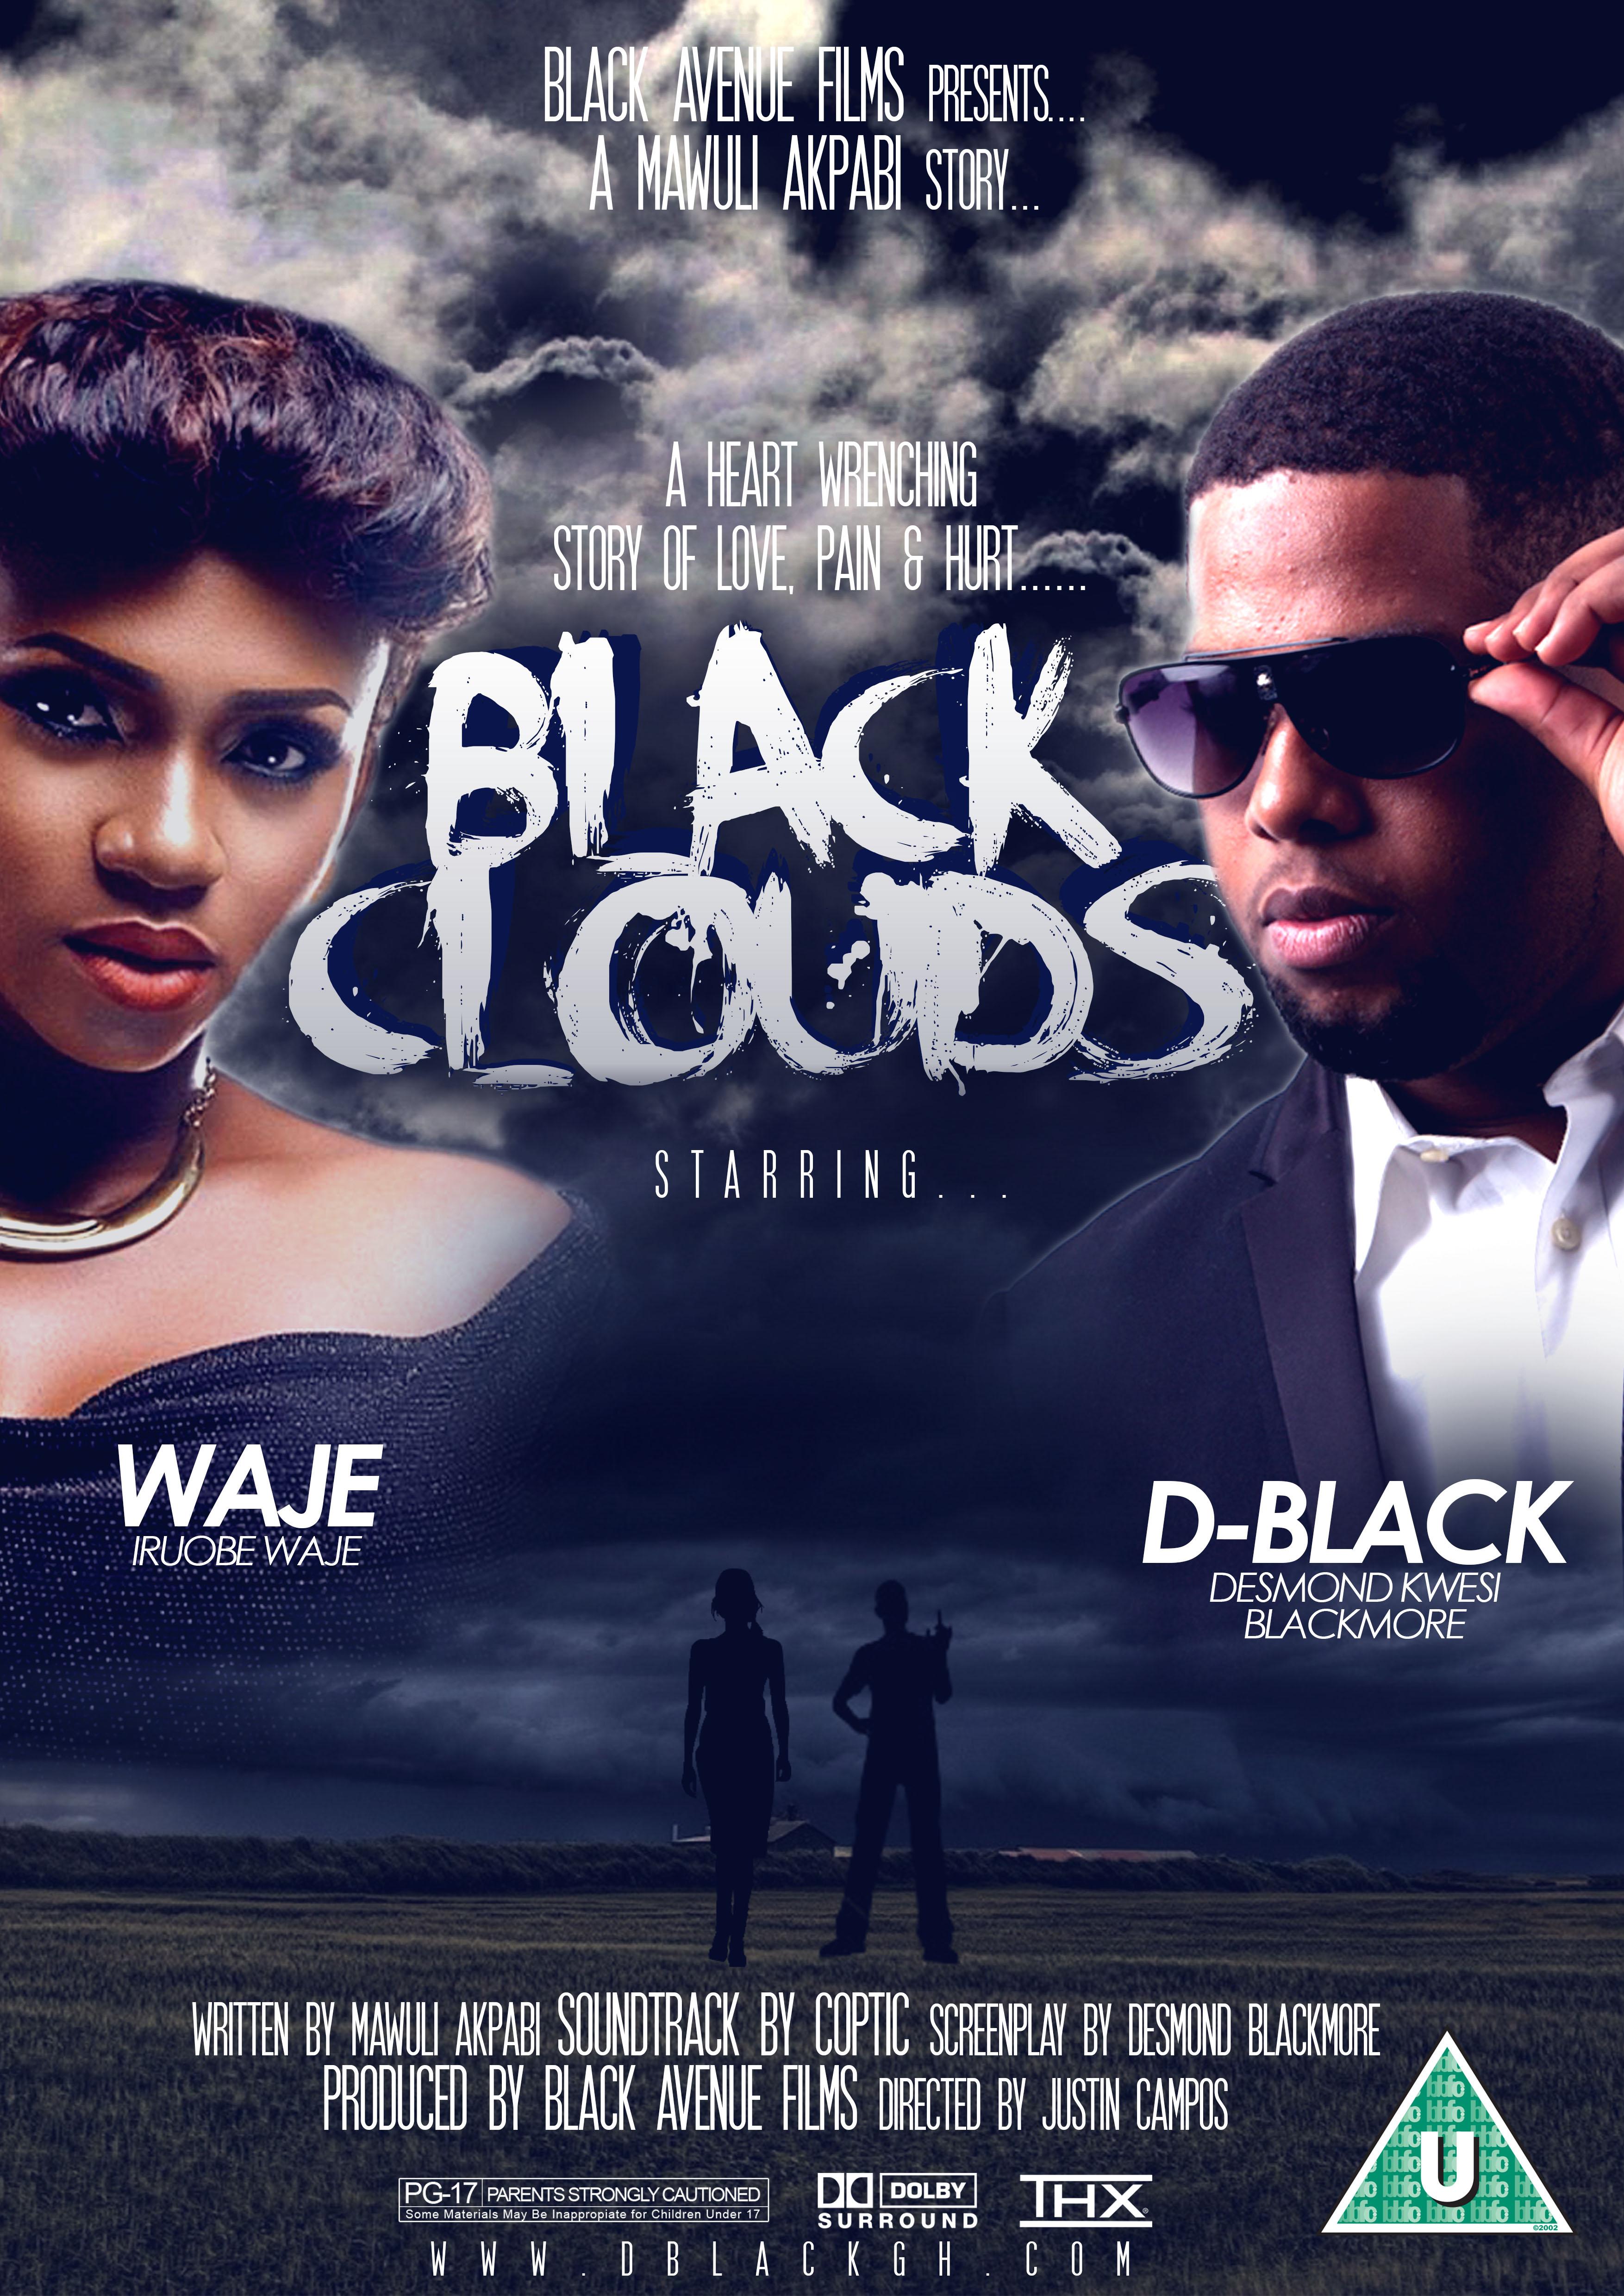 D-Black Black Clouds ft. Waje Poster